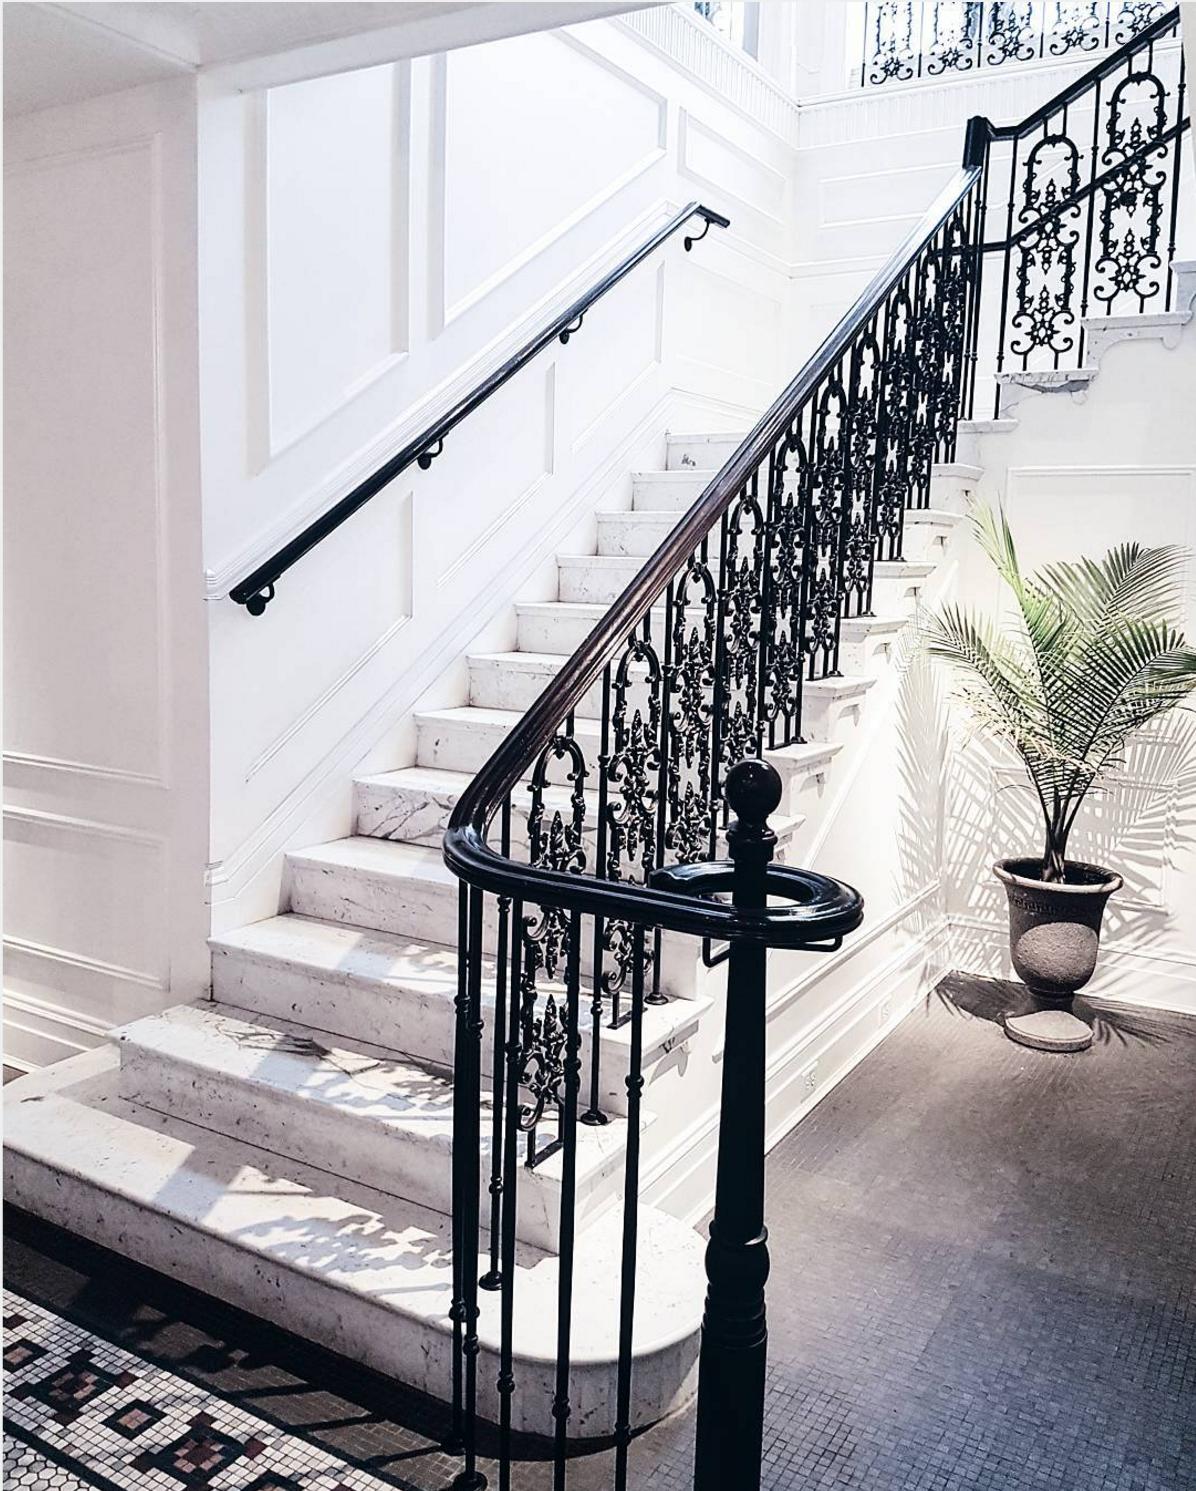 101 planos de casas dise os de una escalera con estilo for Modelos de escaleras modernas